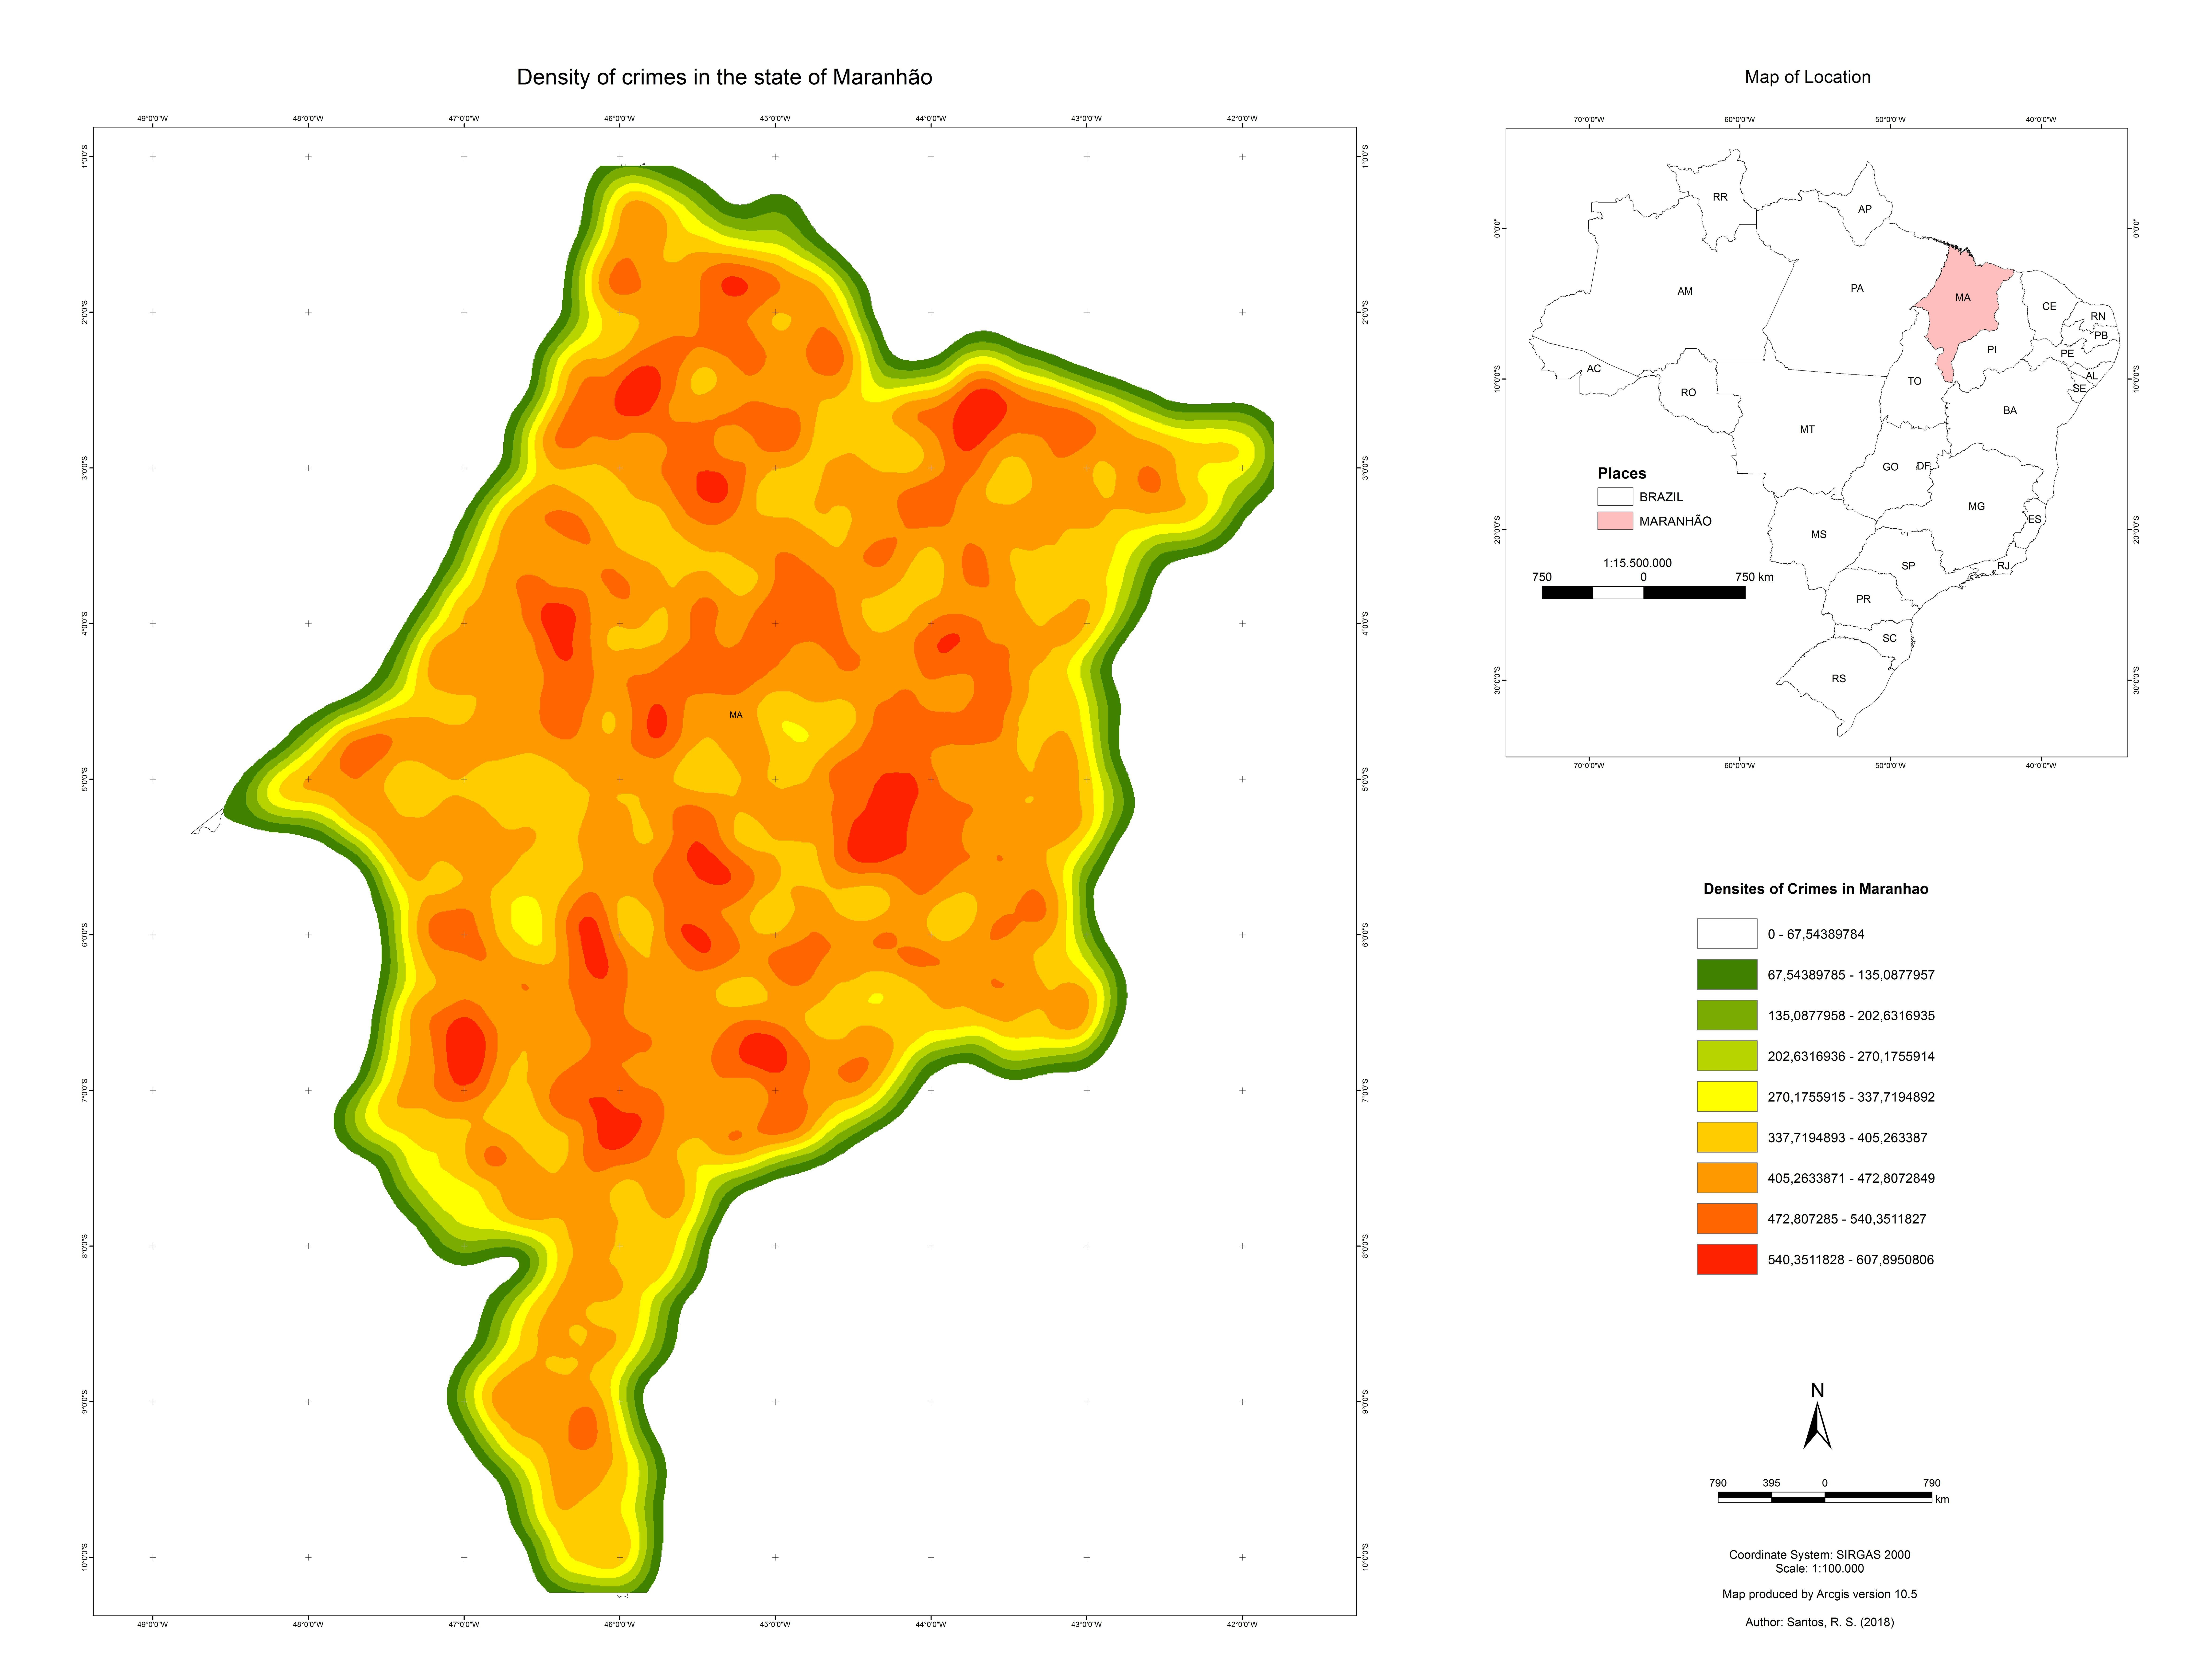 Heatmap showing of Crime density map in maranhão